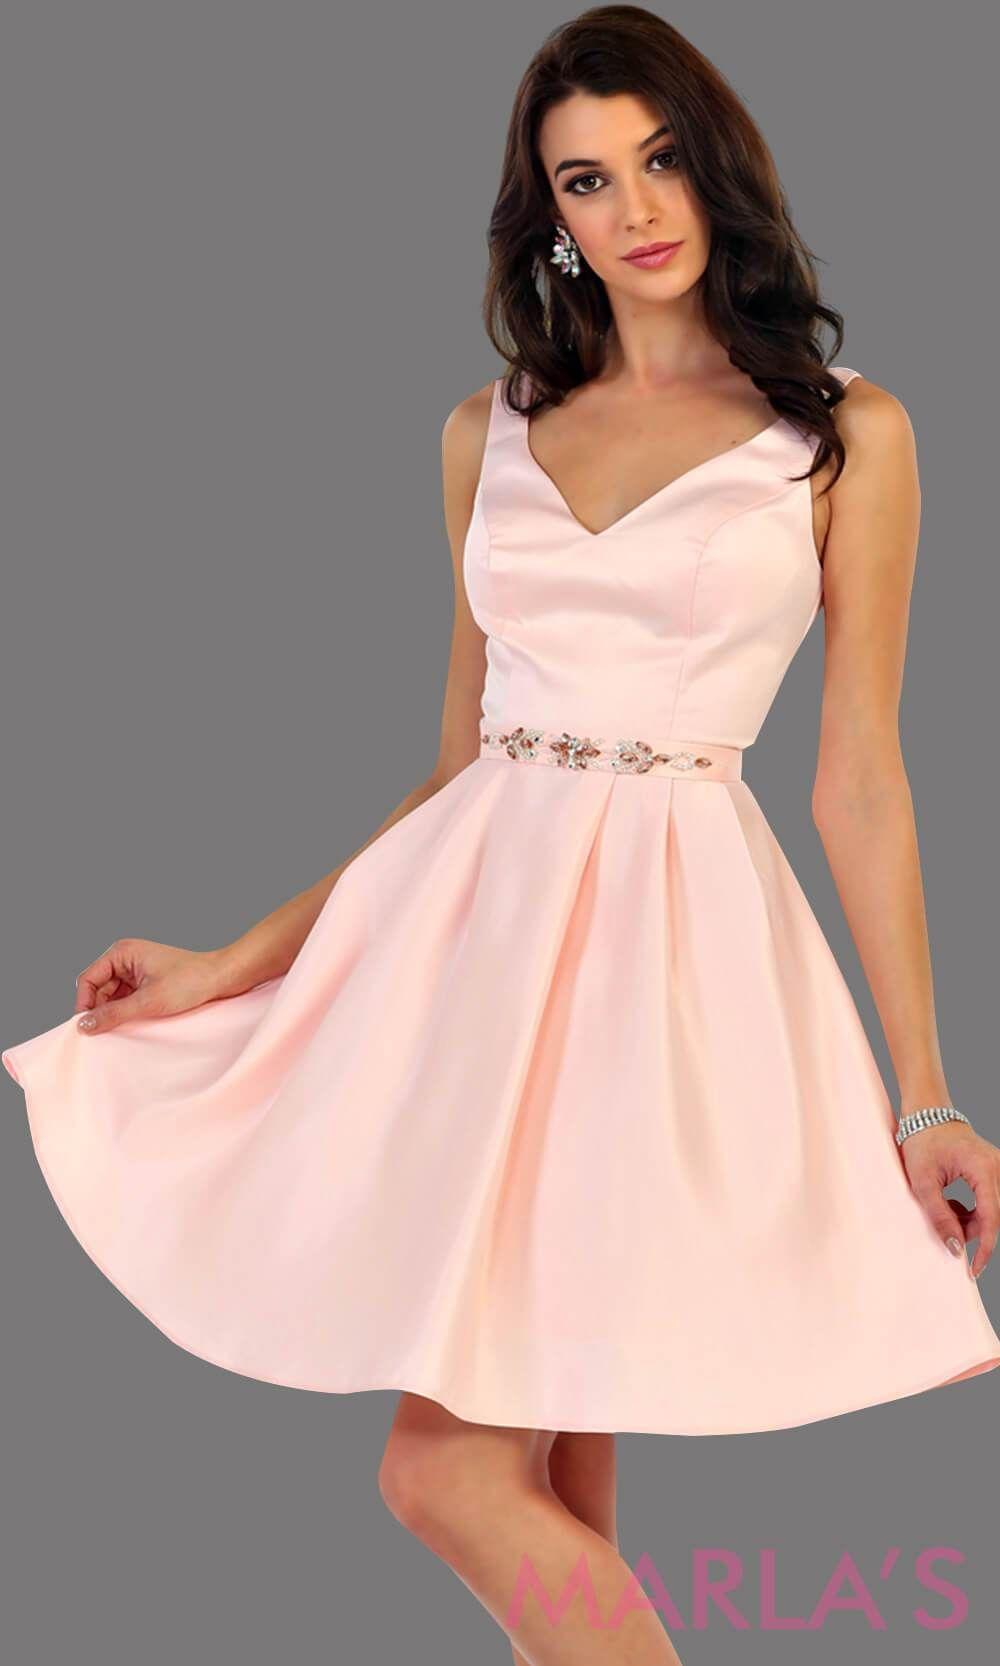 3b1da040ec 1477-Short v neck taffeta light pink grade 8 grad dress with rhinestone  belt. Perfect as a blush confirmation dress